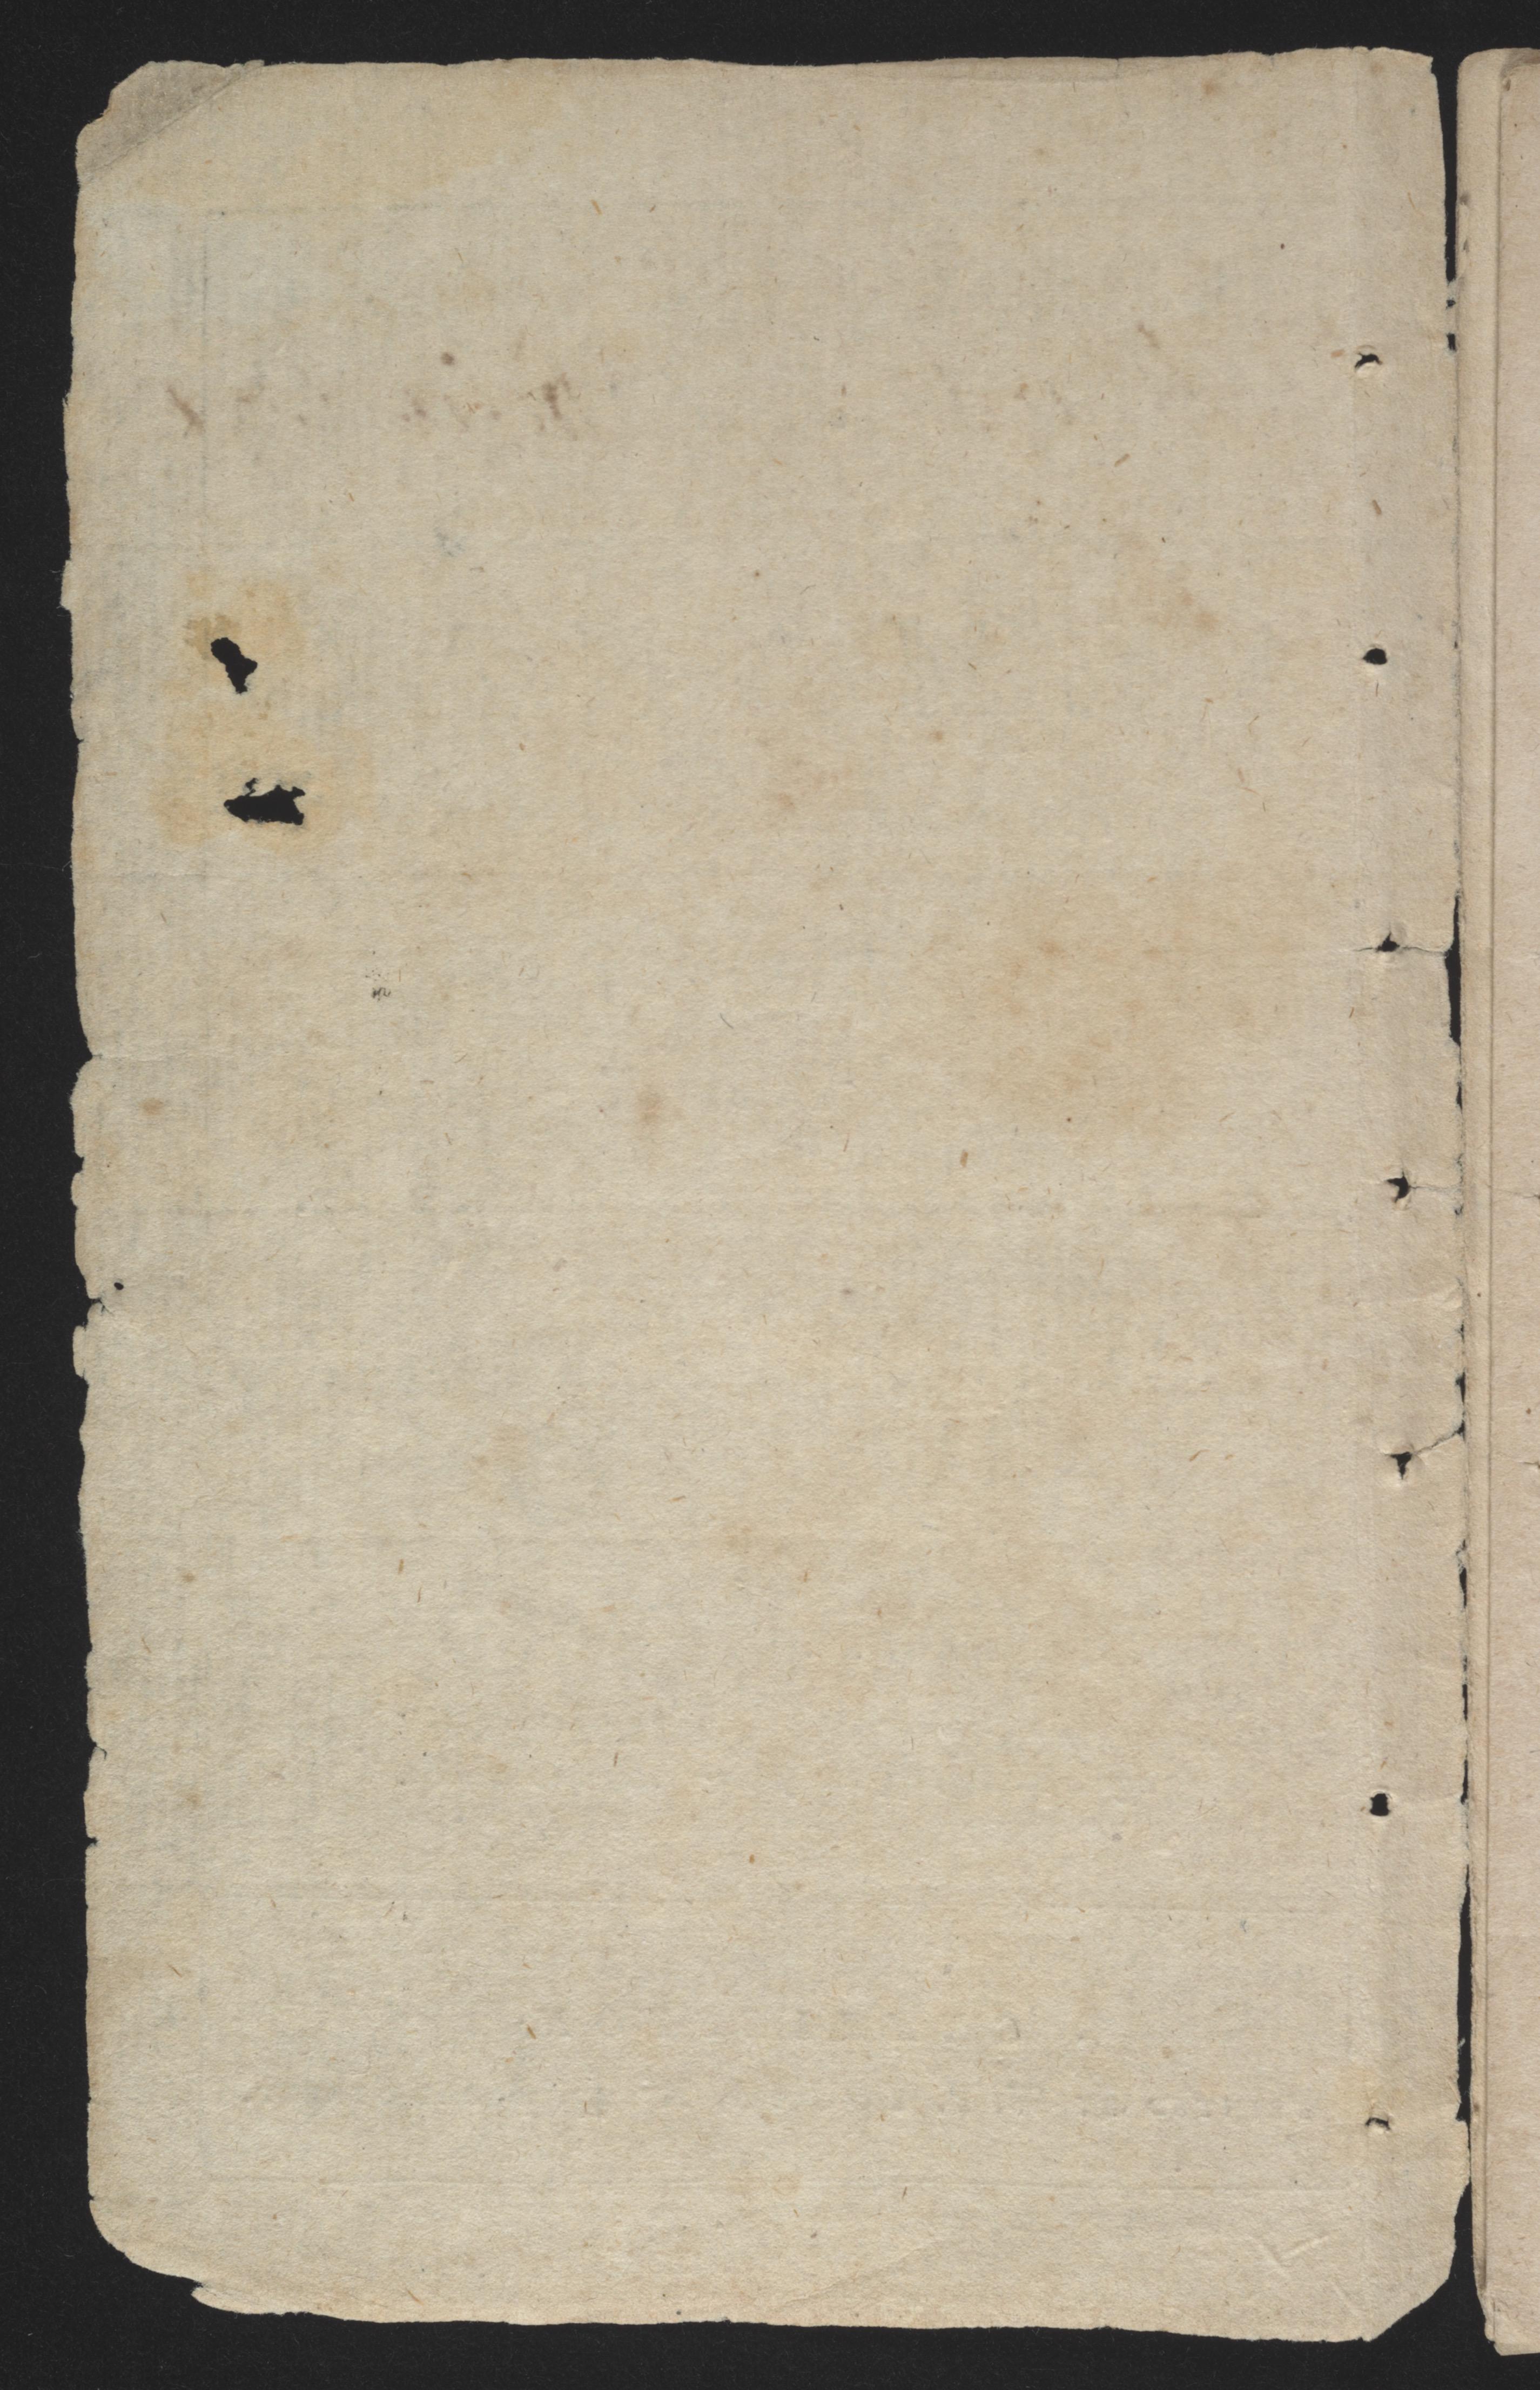 Sandy Island Plantation Journal, Volume 3, 1798, Page 1